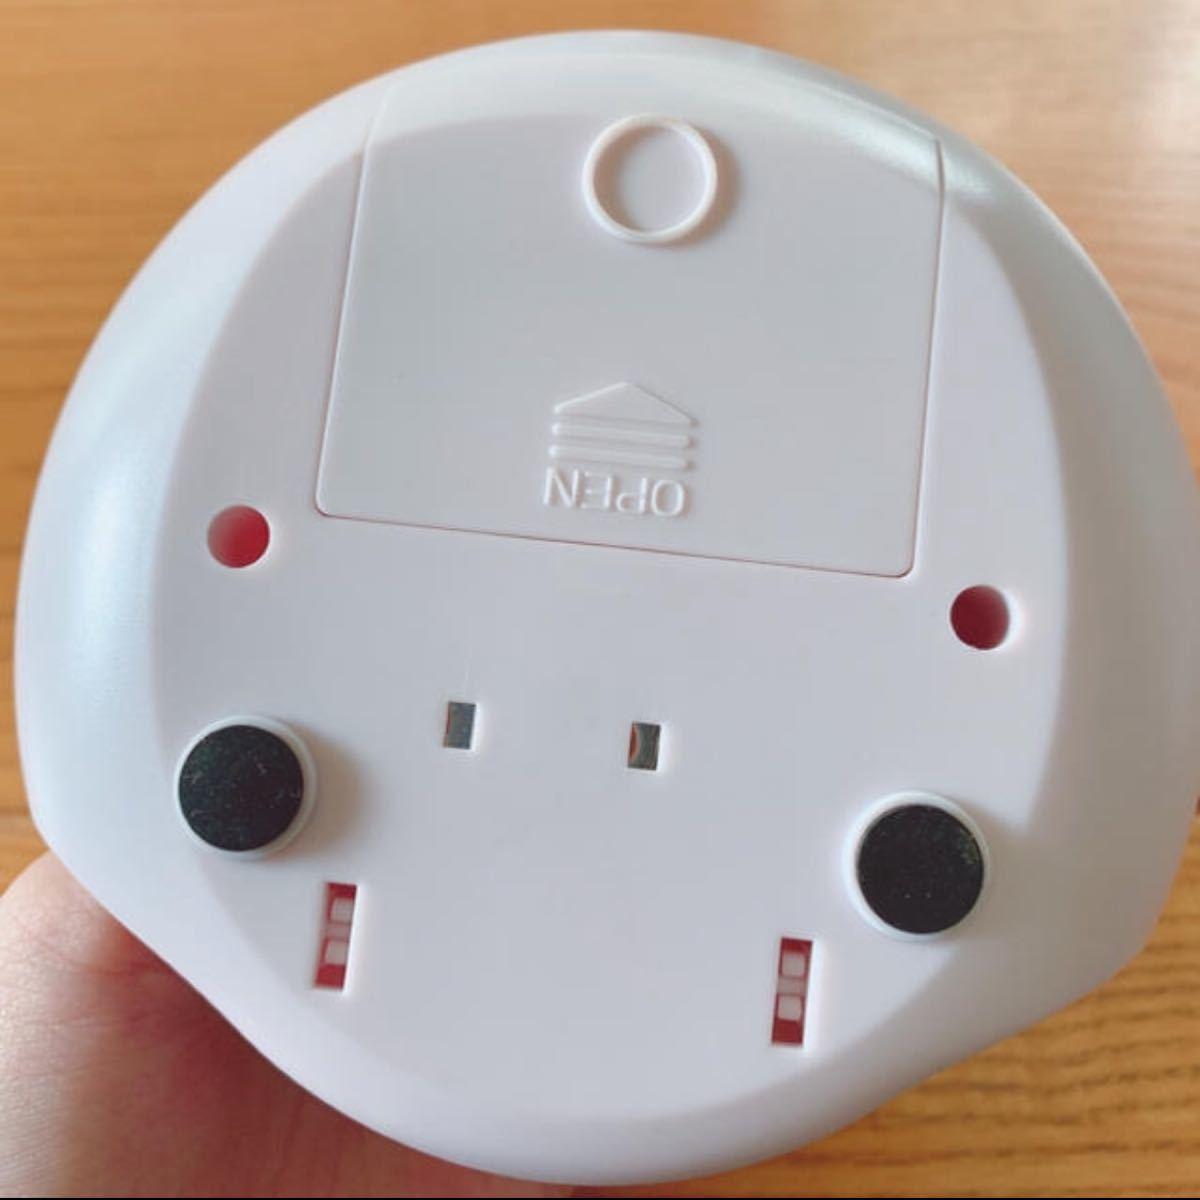 Nail Fan ネイル乾燥機 電池セット